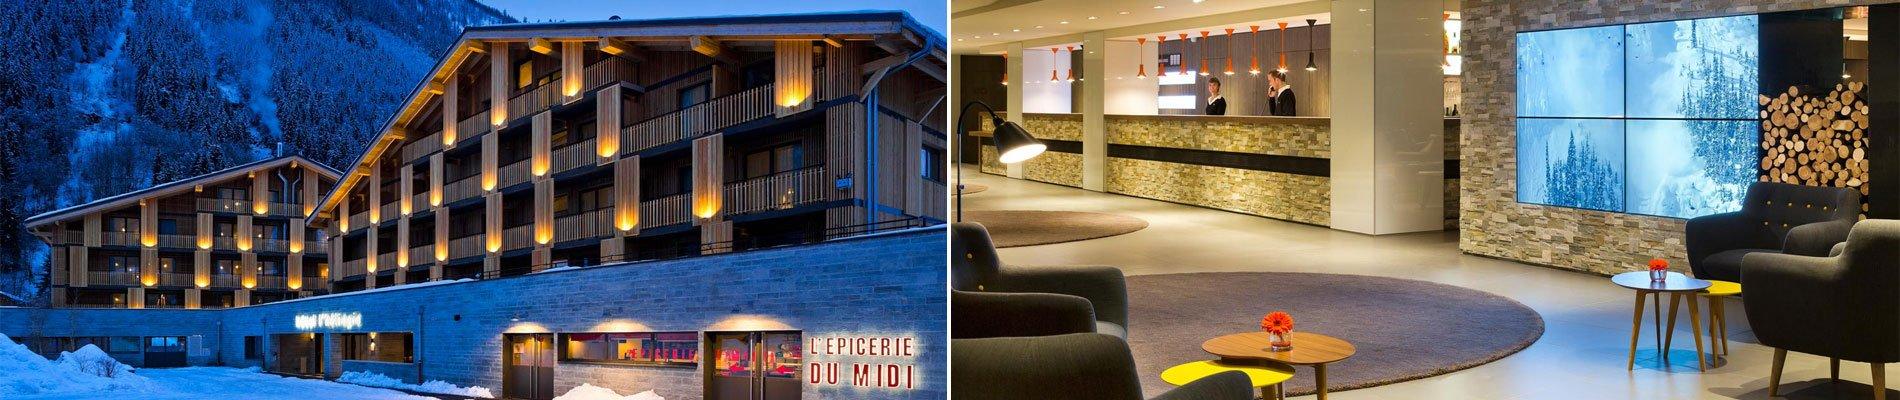 2017 heliopic-hotel-chamonix-mont-blanc